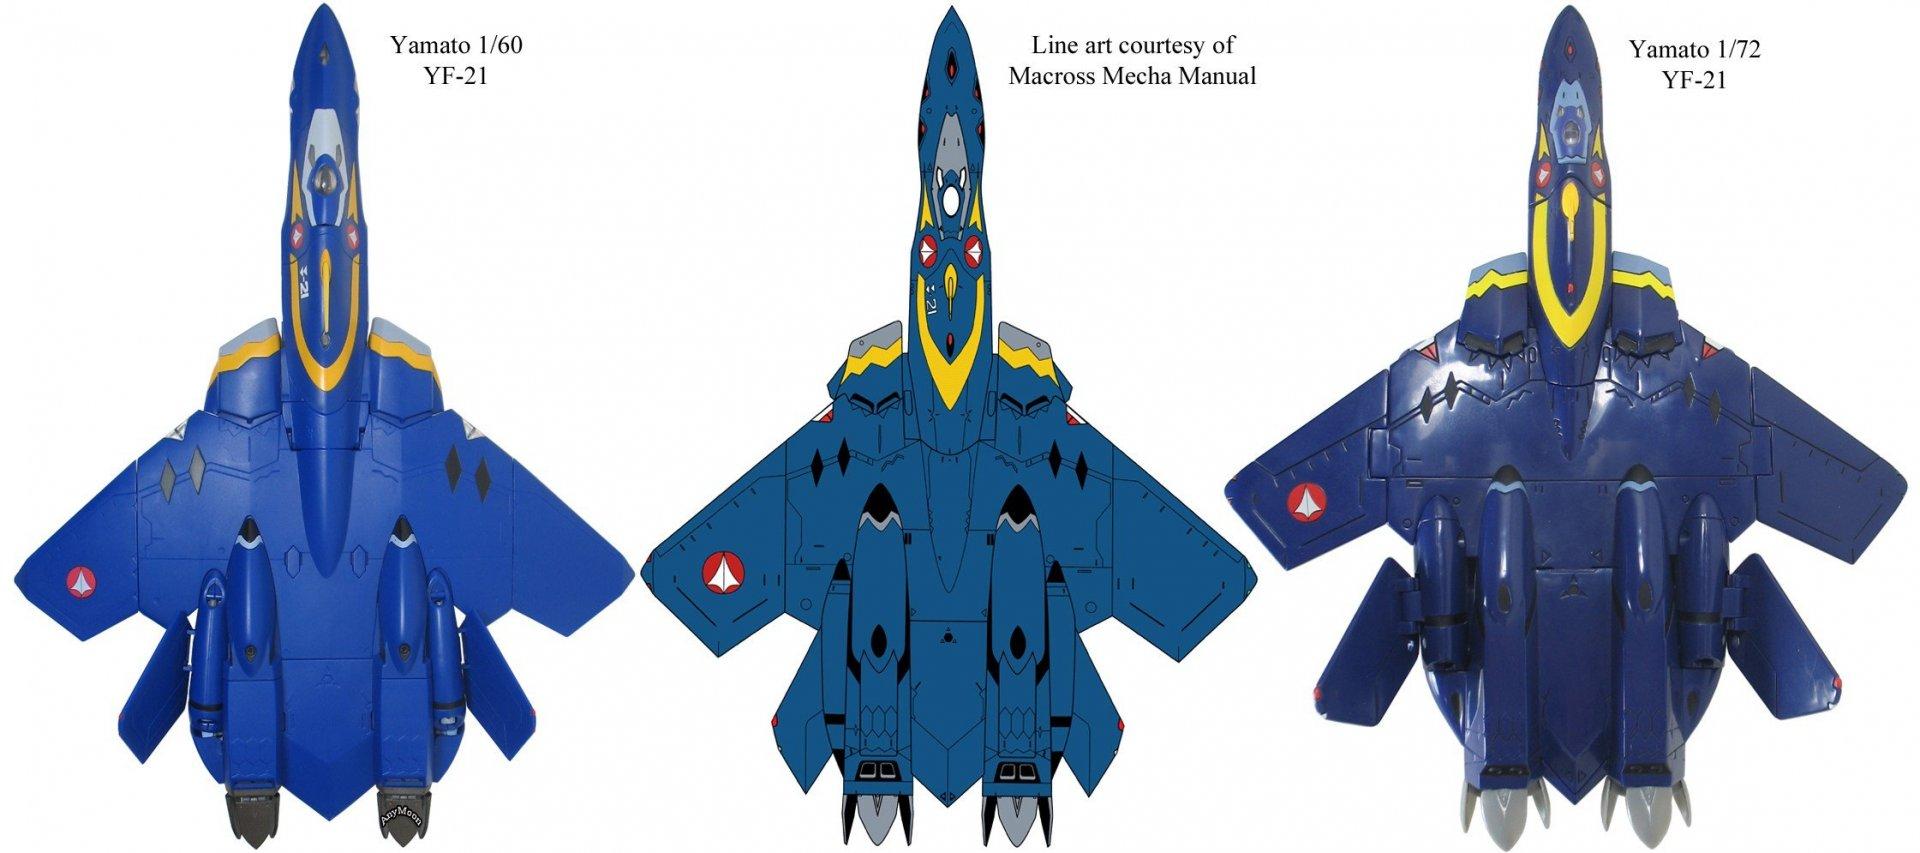 160-Yamato-YF-21-1.jpg